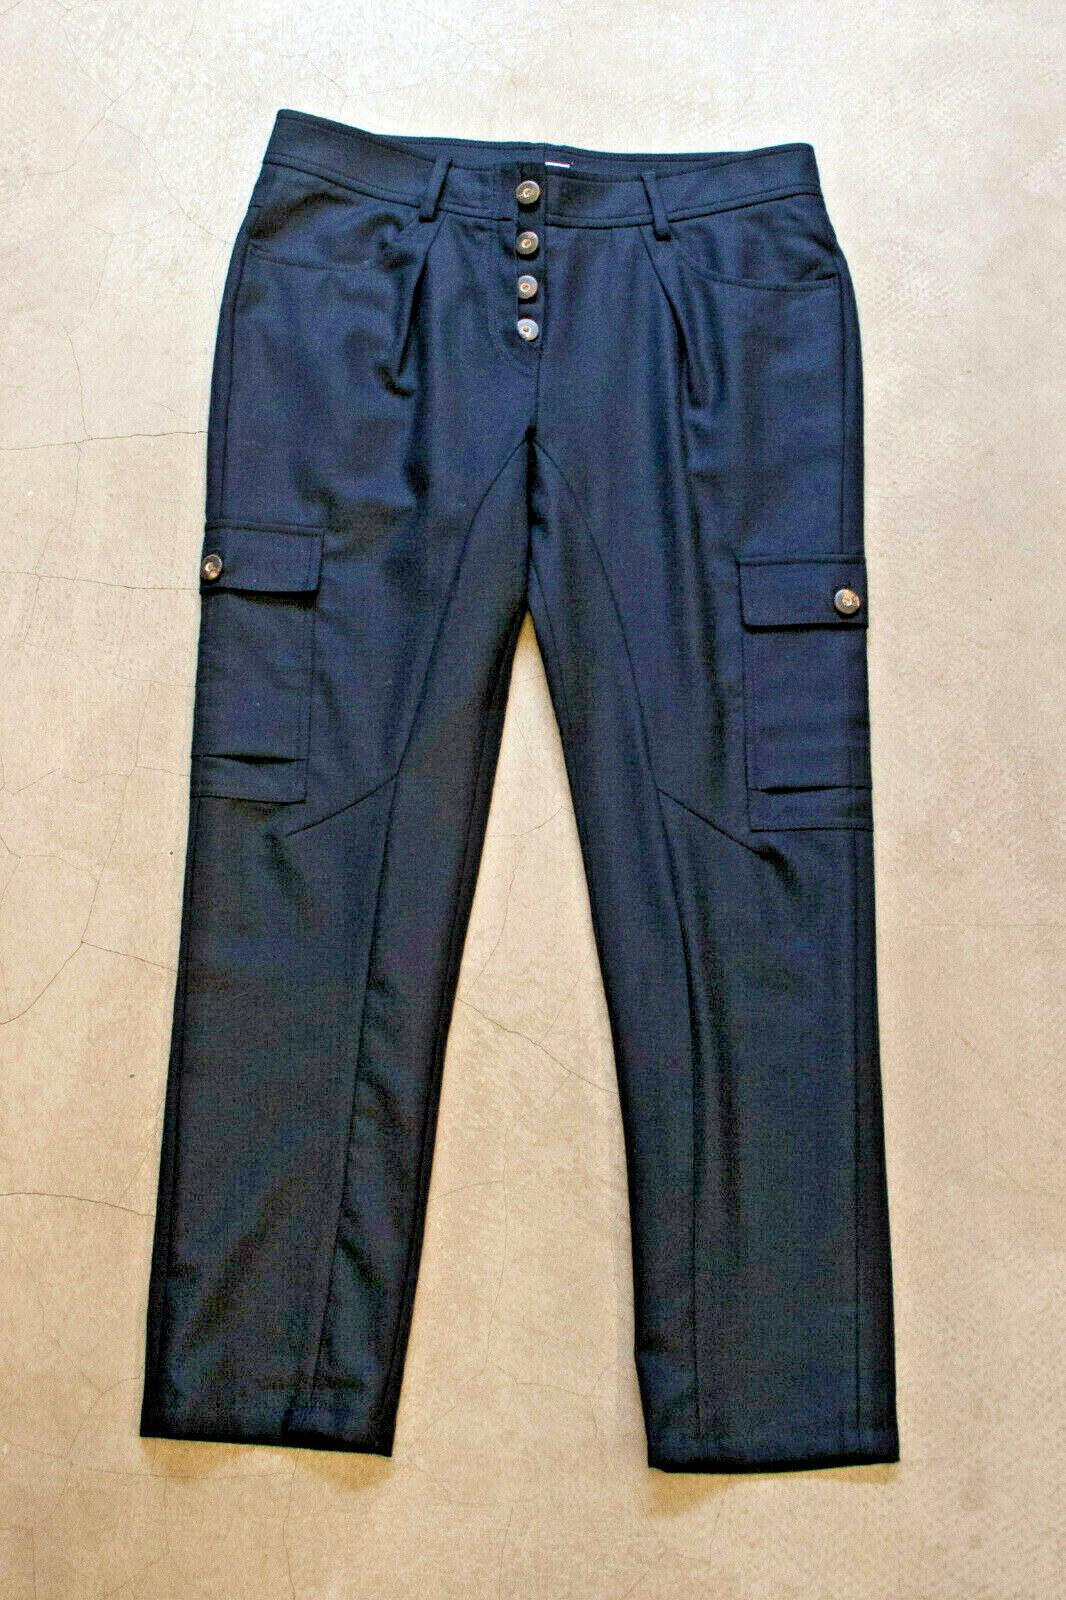 Brunello Cucinelli pantalones azul jinete  pantalones d36 f38 i42 azul wool trousers id3230  barato